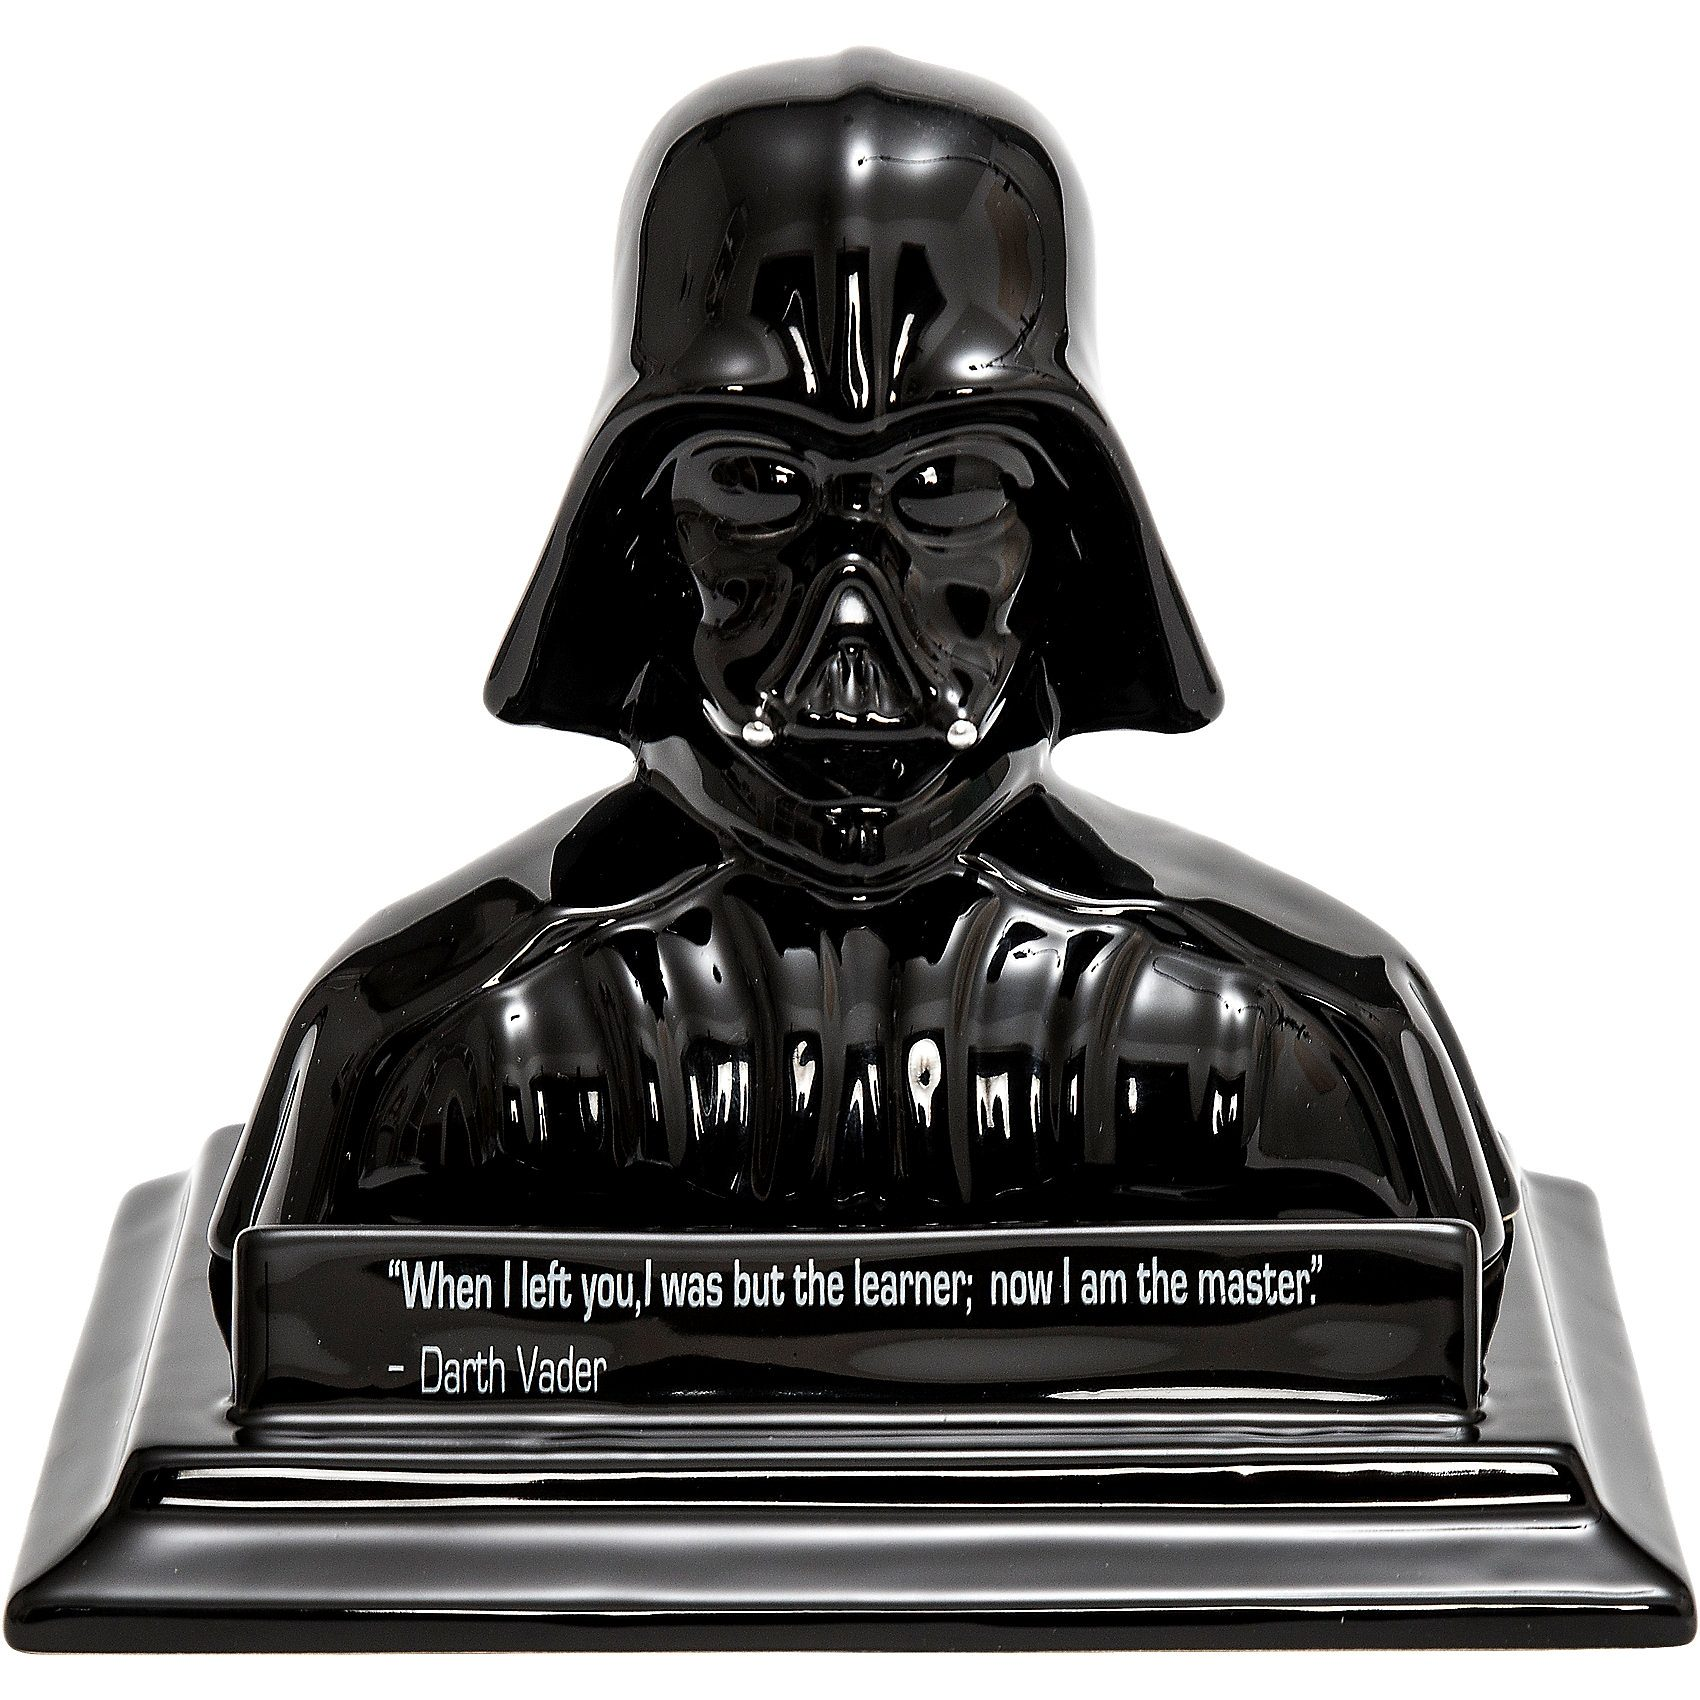 JOY TOY 3D-Büste Spardose Darth Vader Star Wars, Keramik